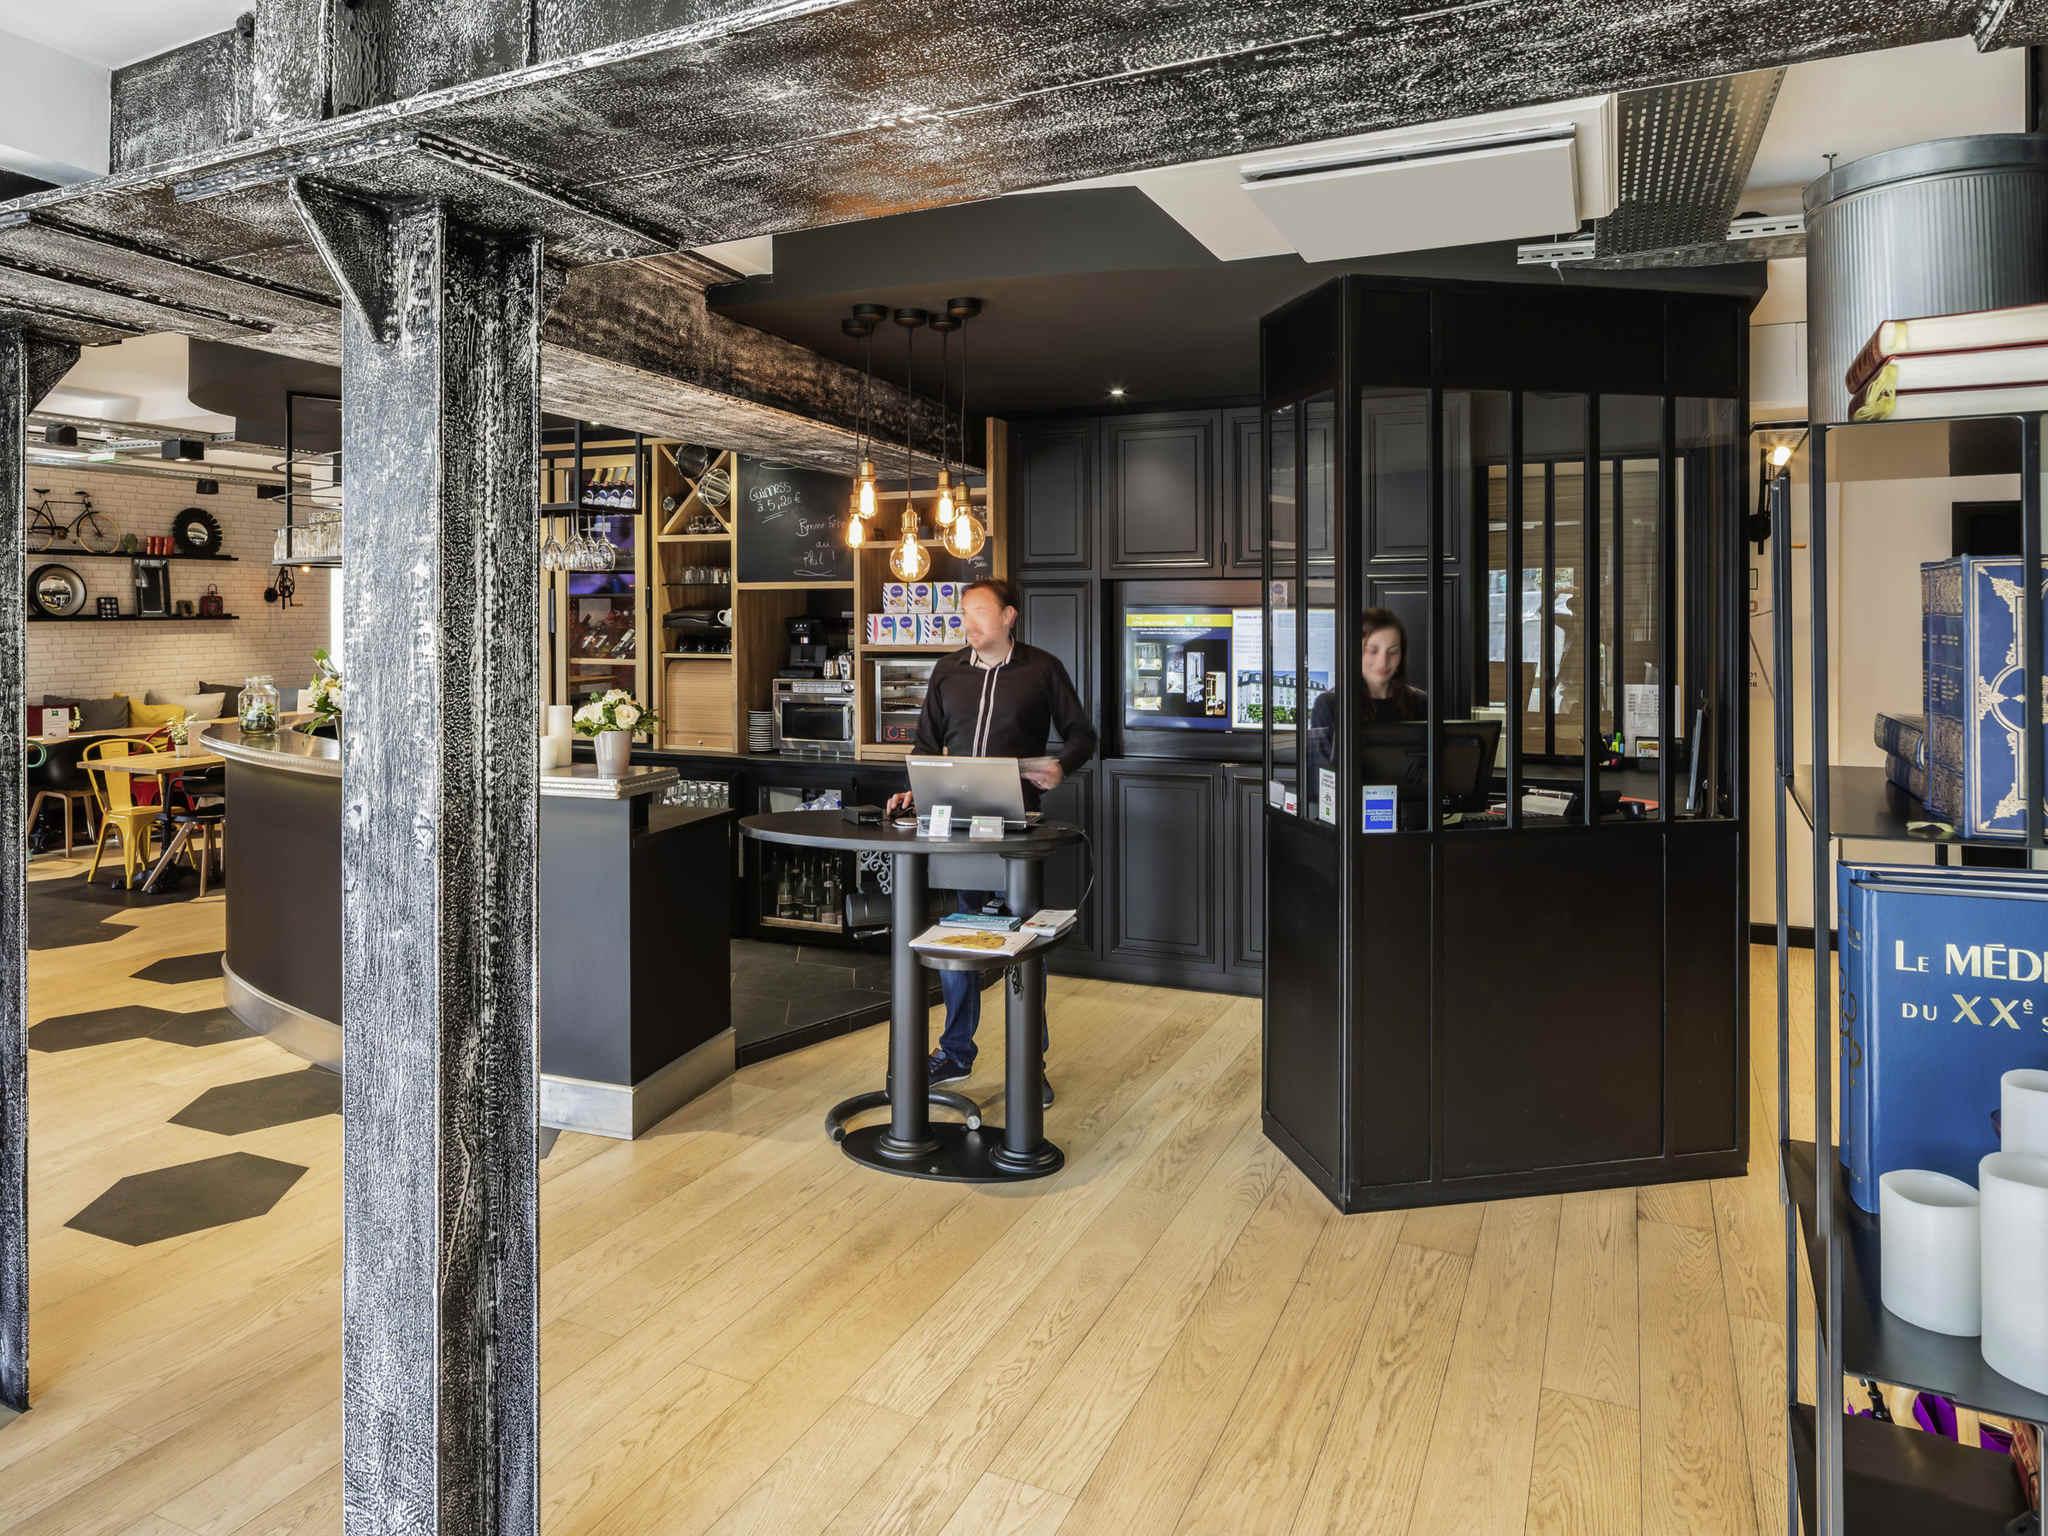 Otel – ibis Styles Dinan Centre-Ville